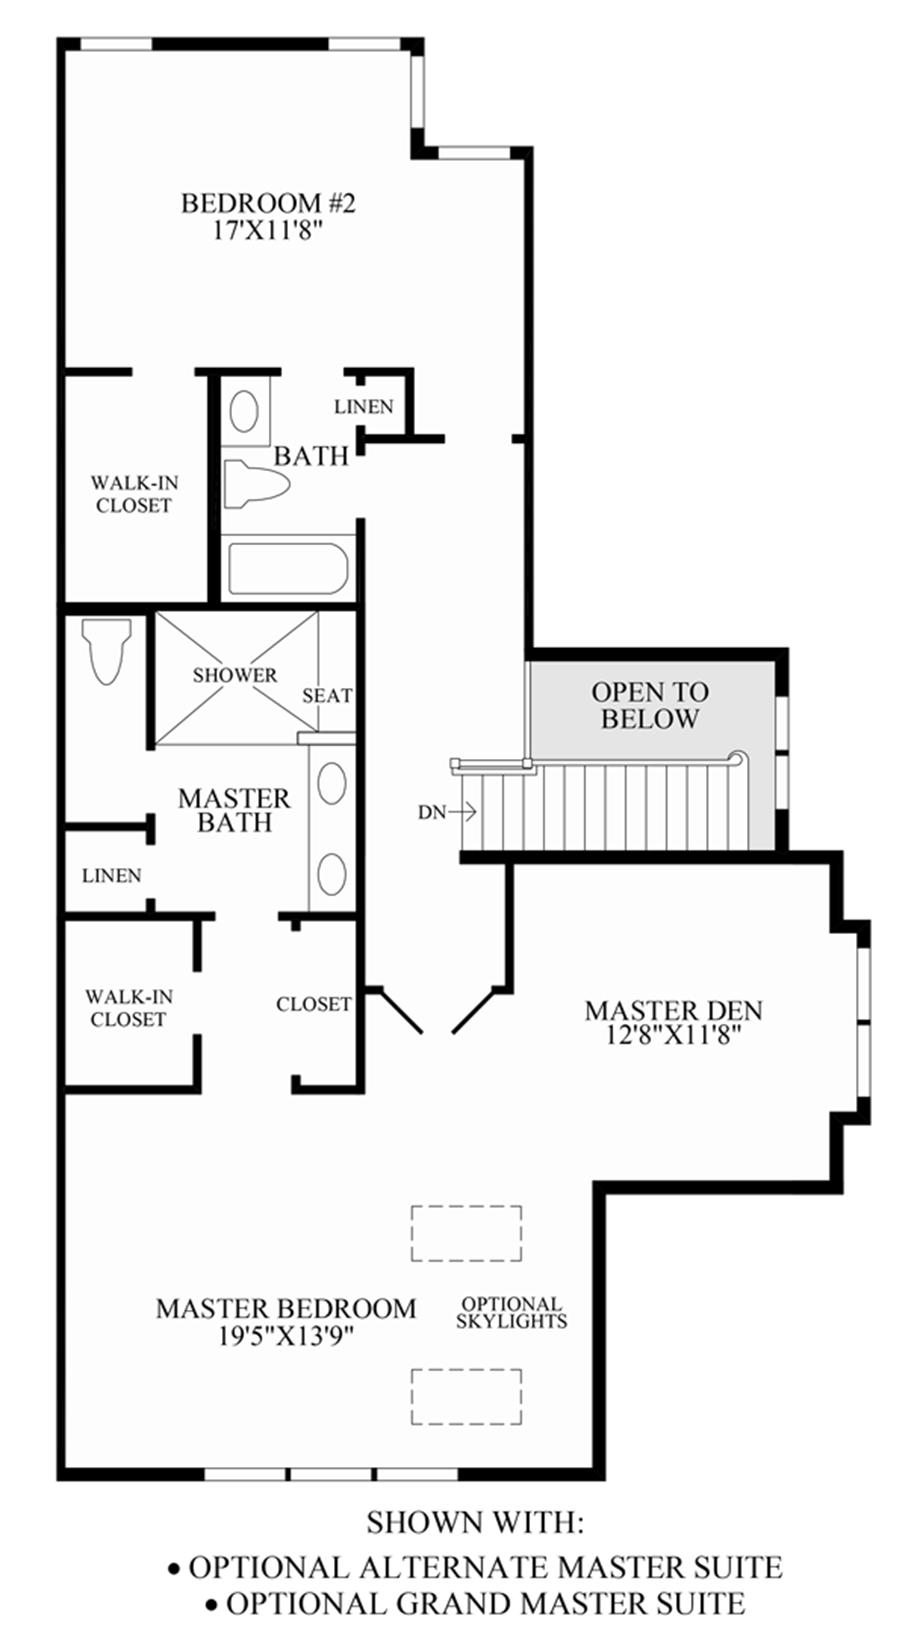 Optional Alternate Master Suite/Grand Master Suite Floor Plan